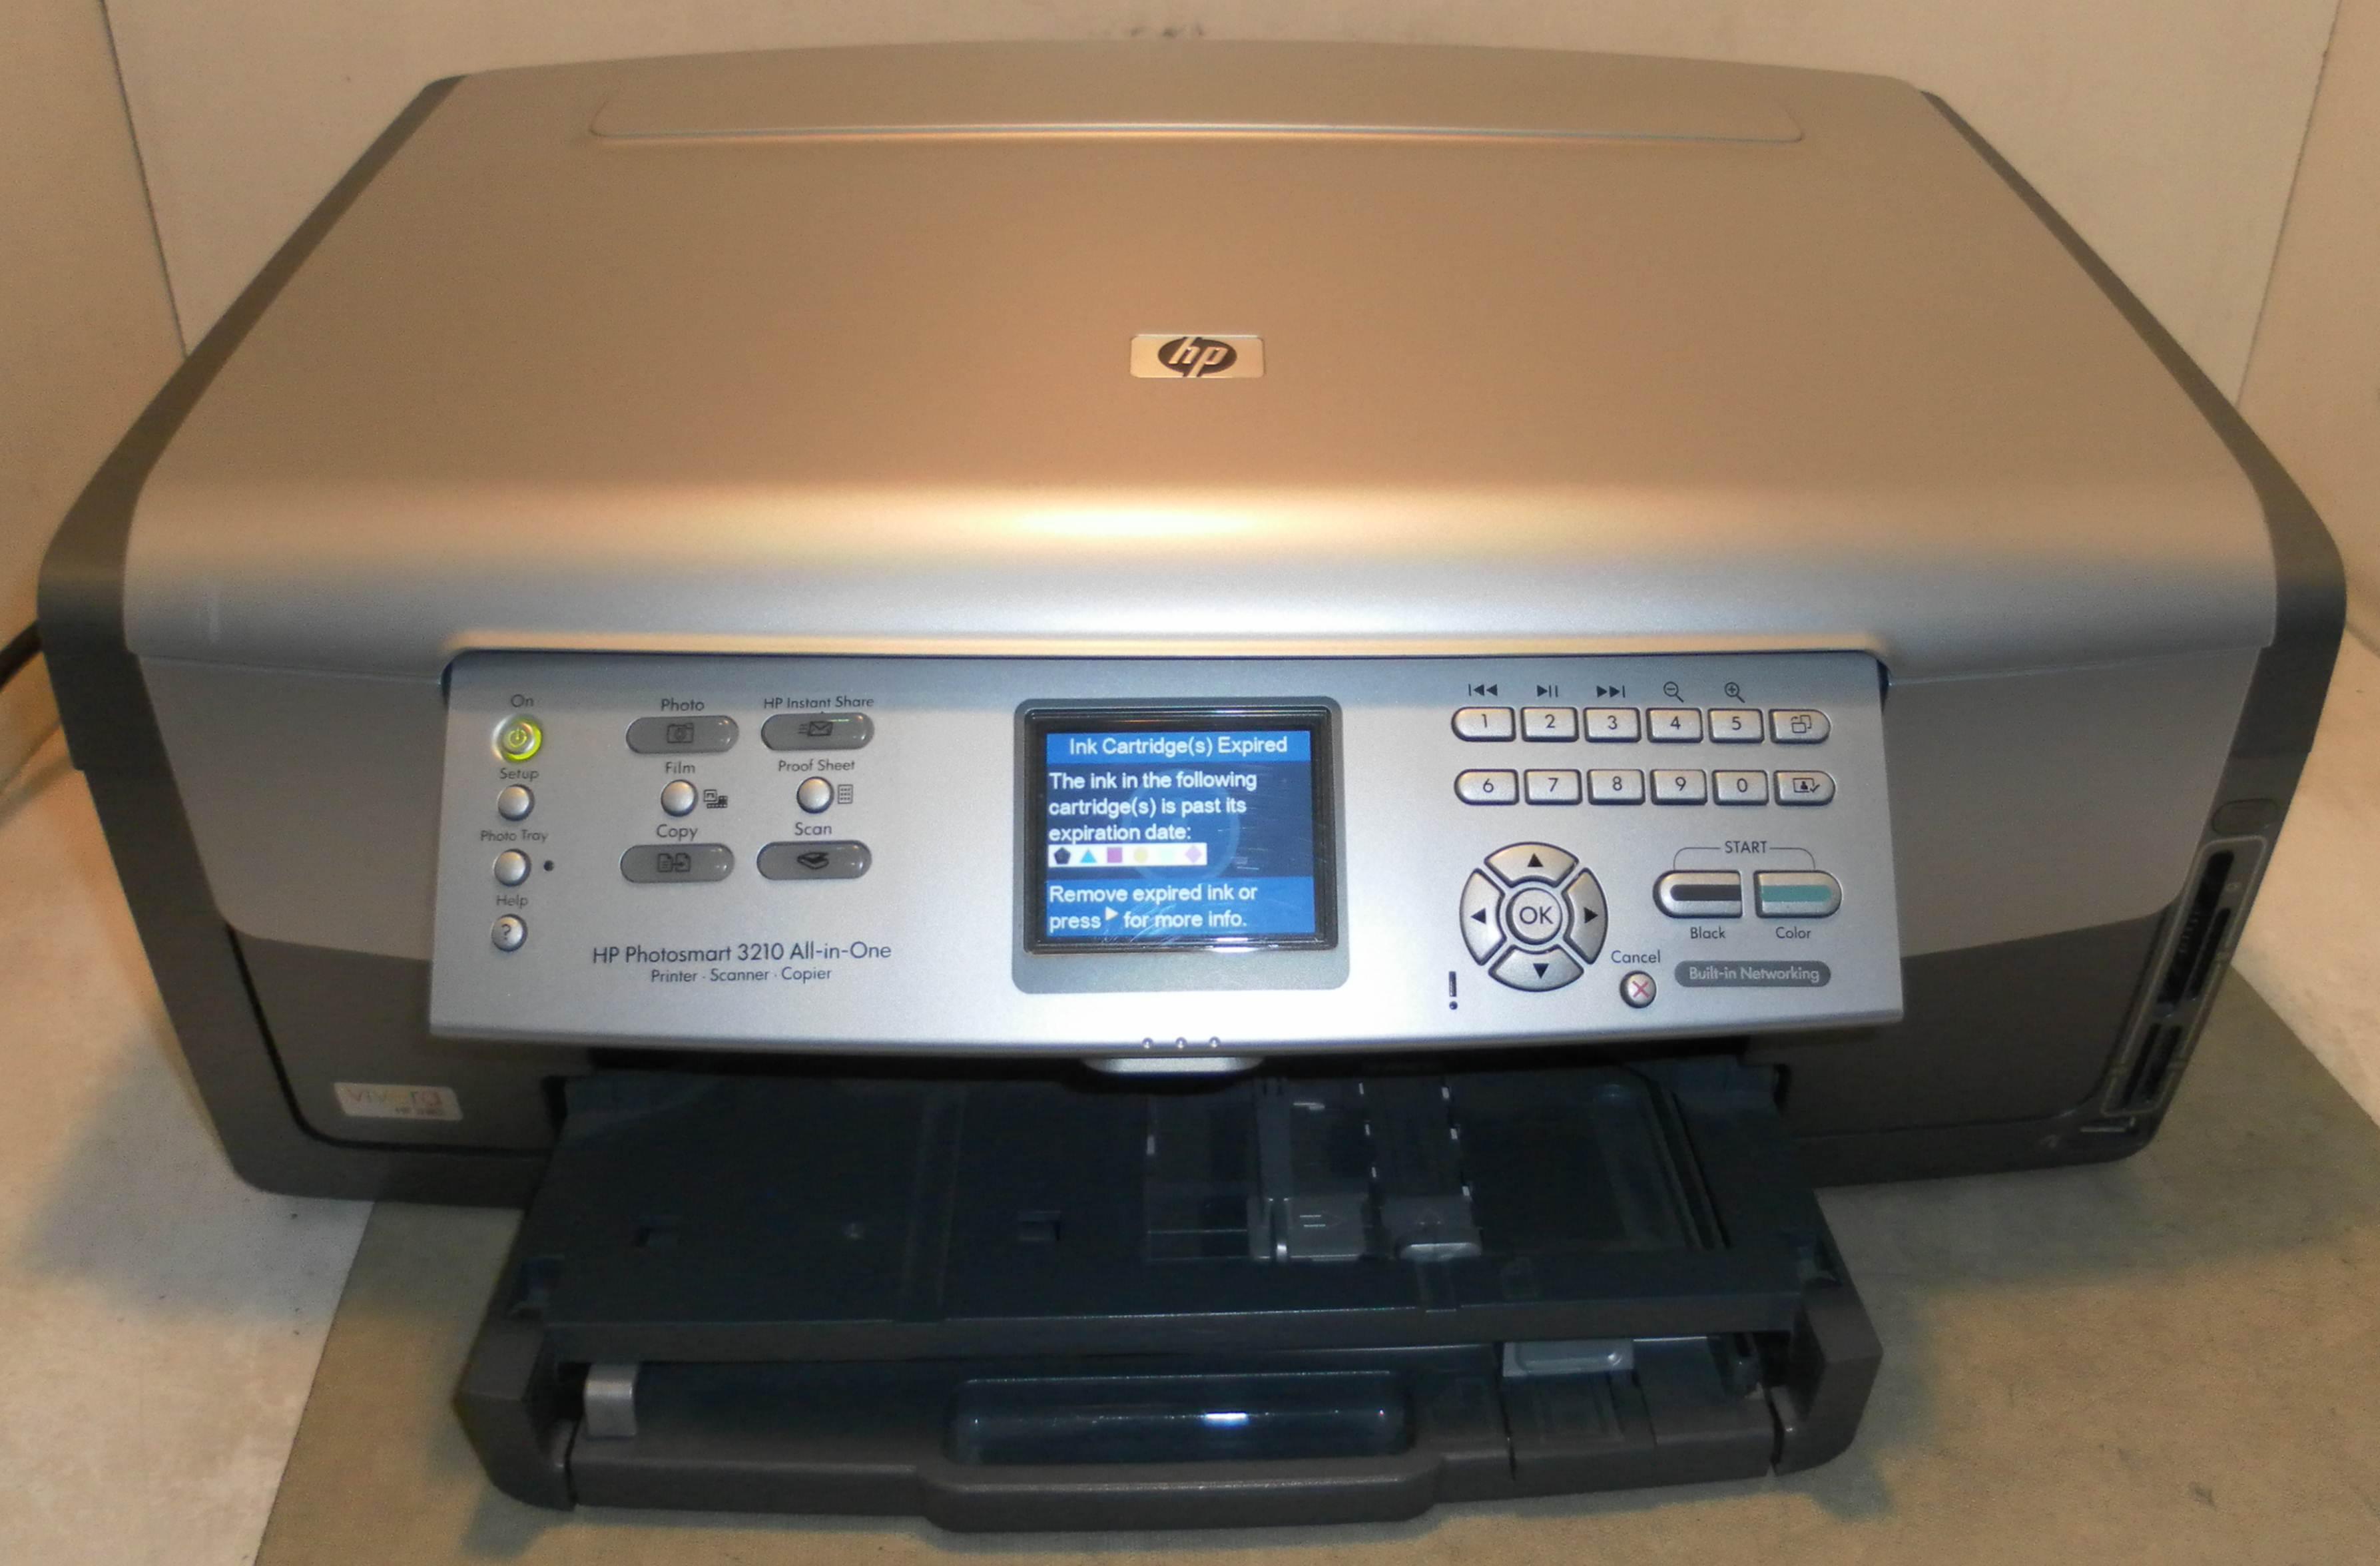 HP Photosmart 3210 All in One Inkjet Printer Q5841A | eBay